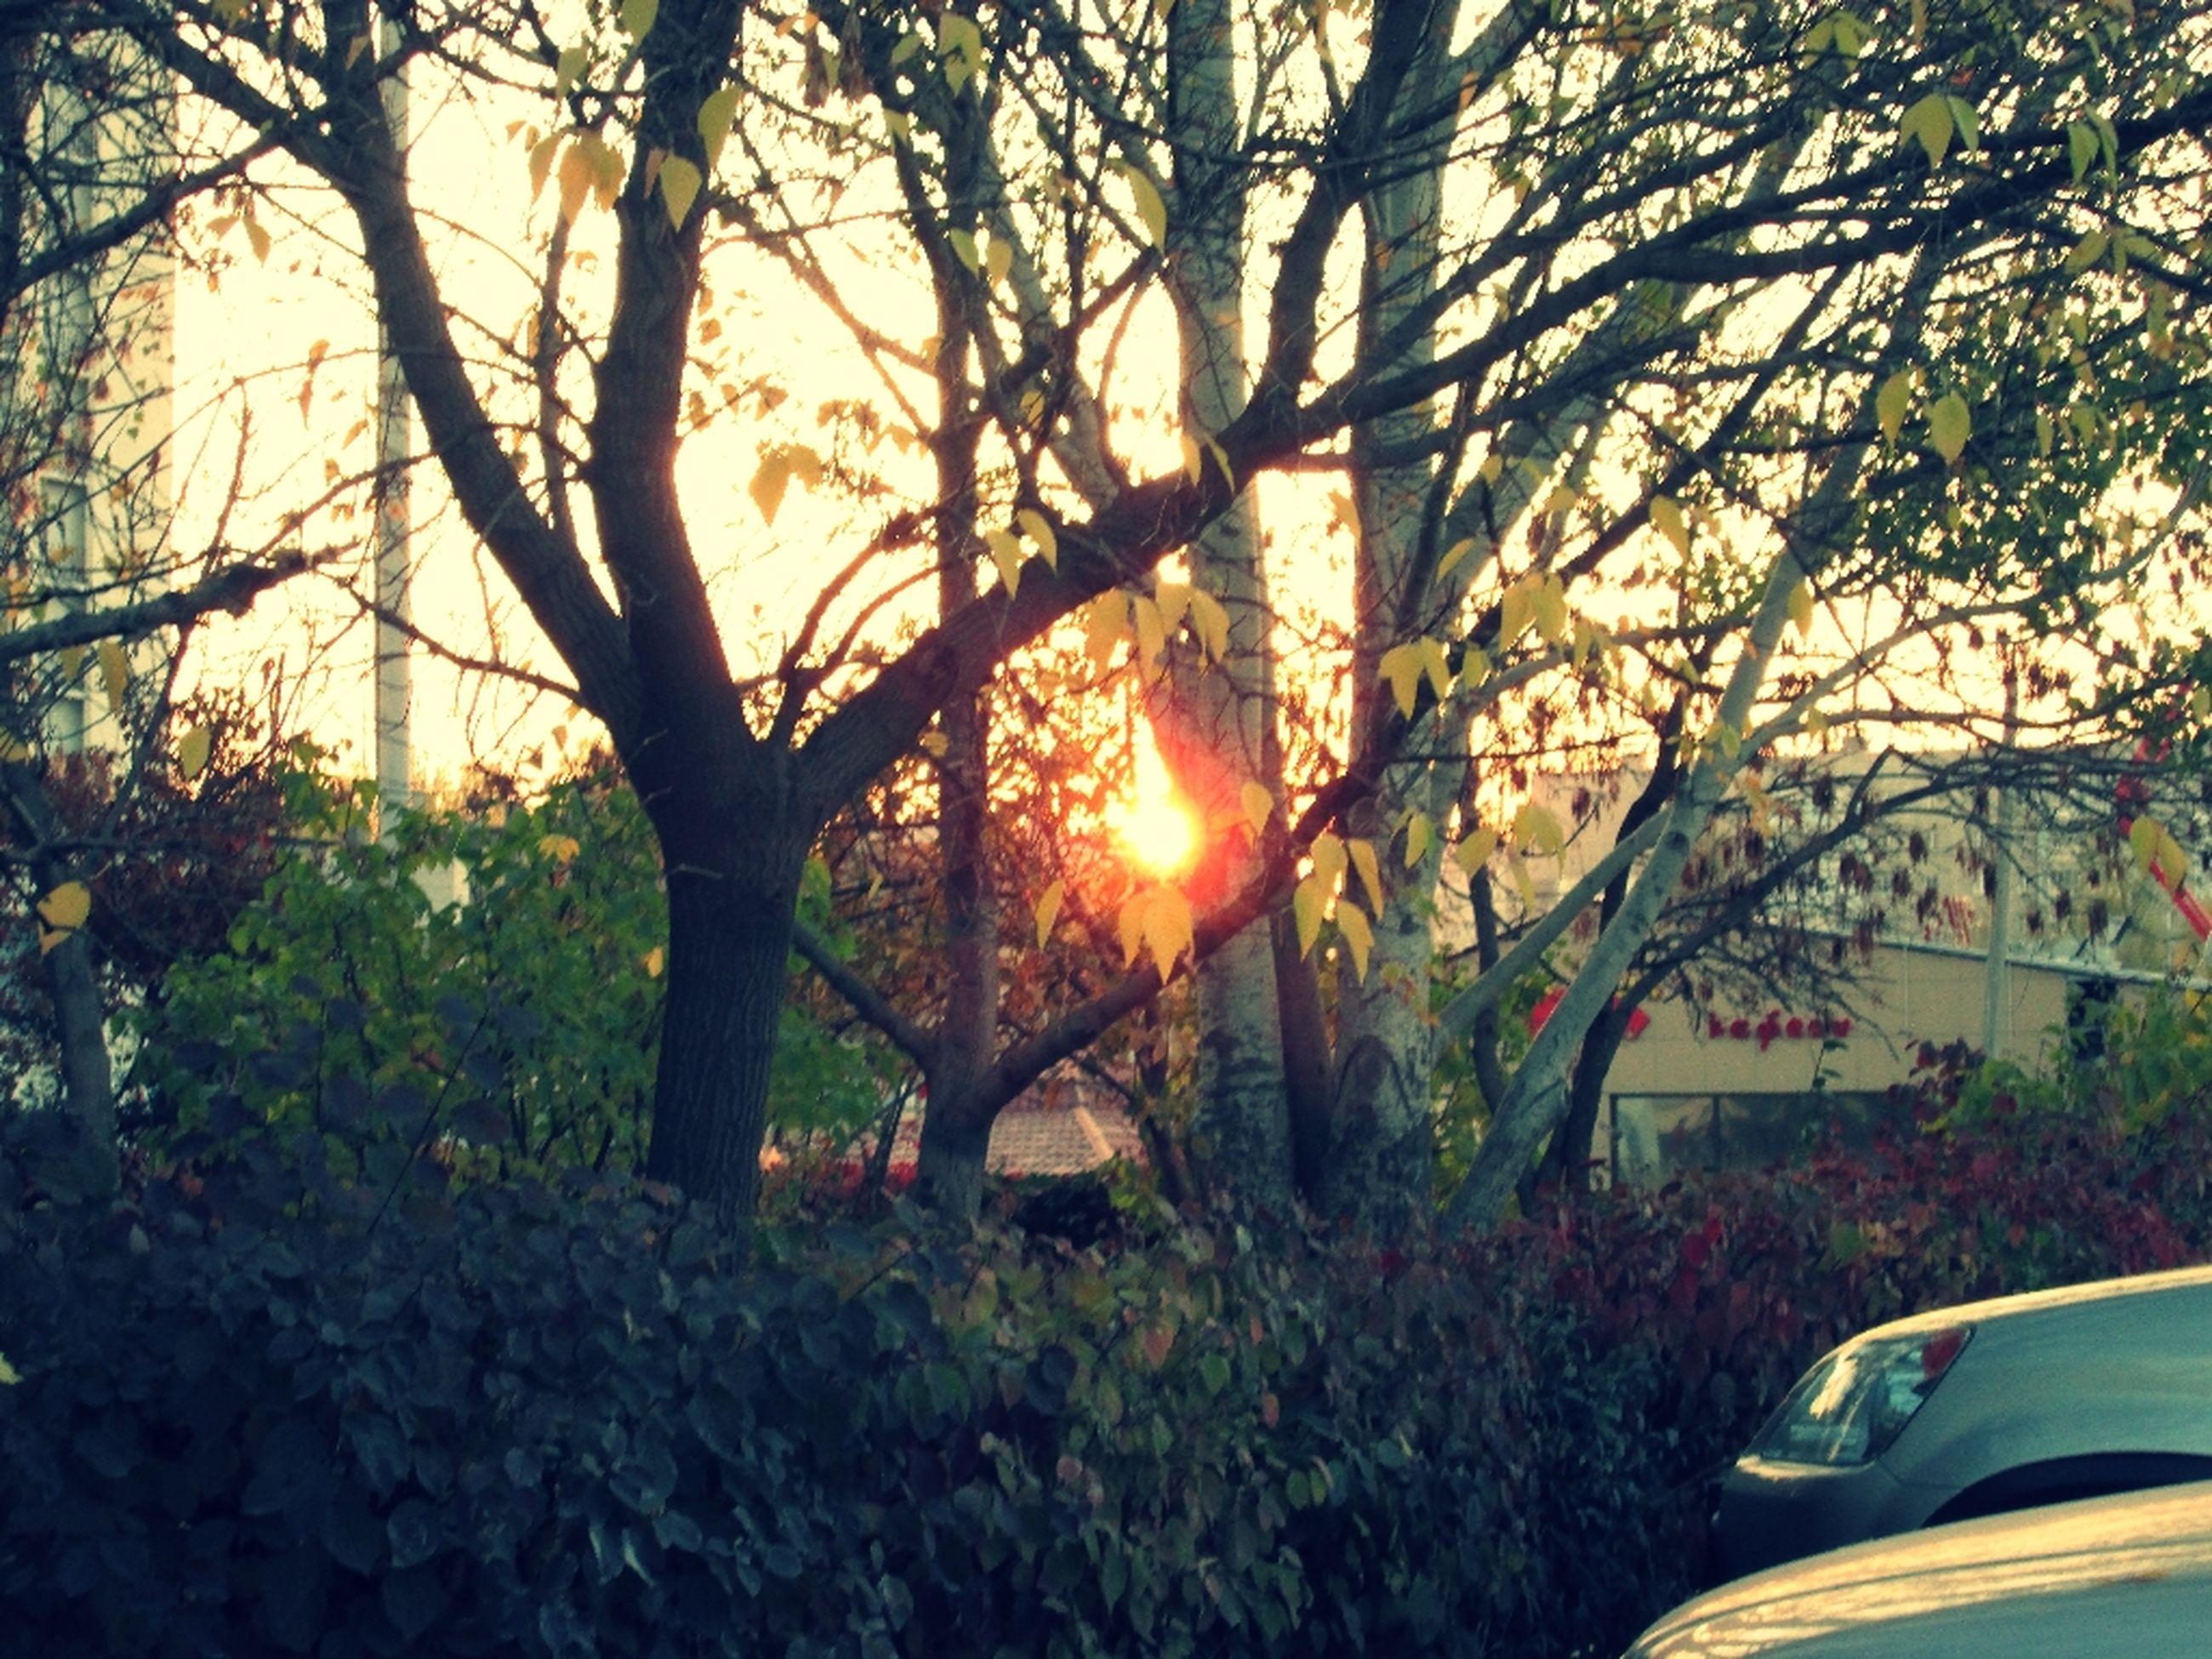 sunset, sun, tree, sunlight, tranquility, growth, beauty in nature, sunbeam, nature, scenics, orange color, tranquil scene, lens flare, branch, plant, sky, tree trunk, back lit, idyllic, landscape